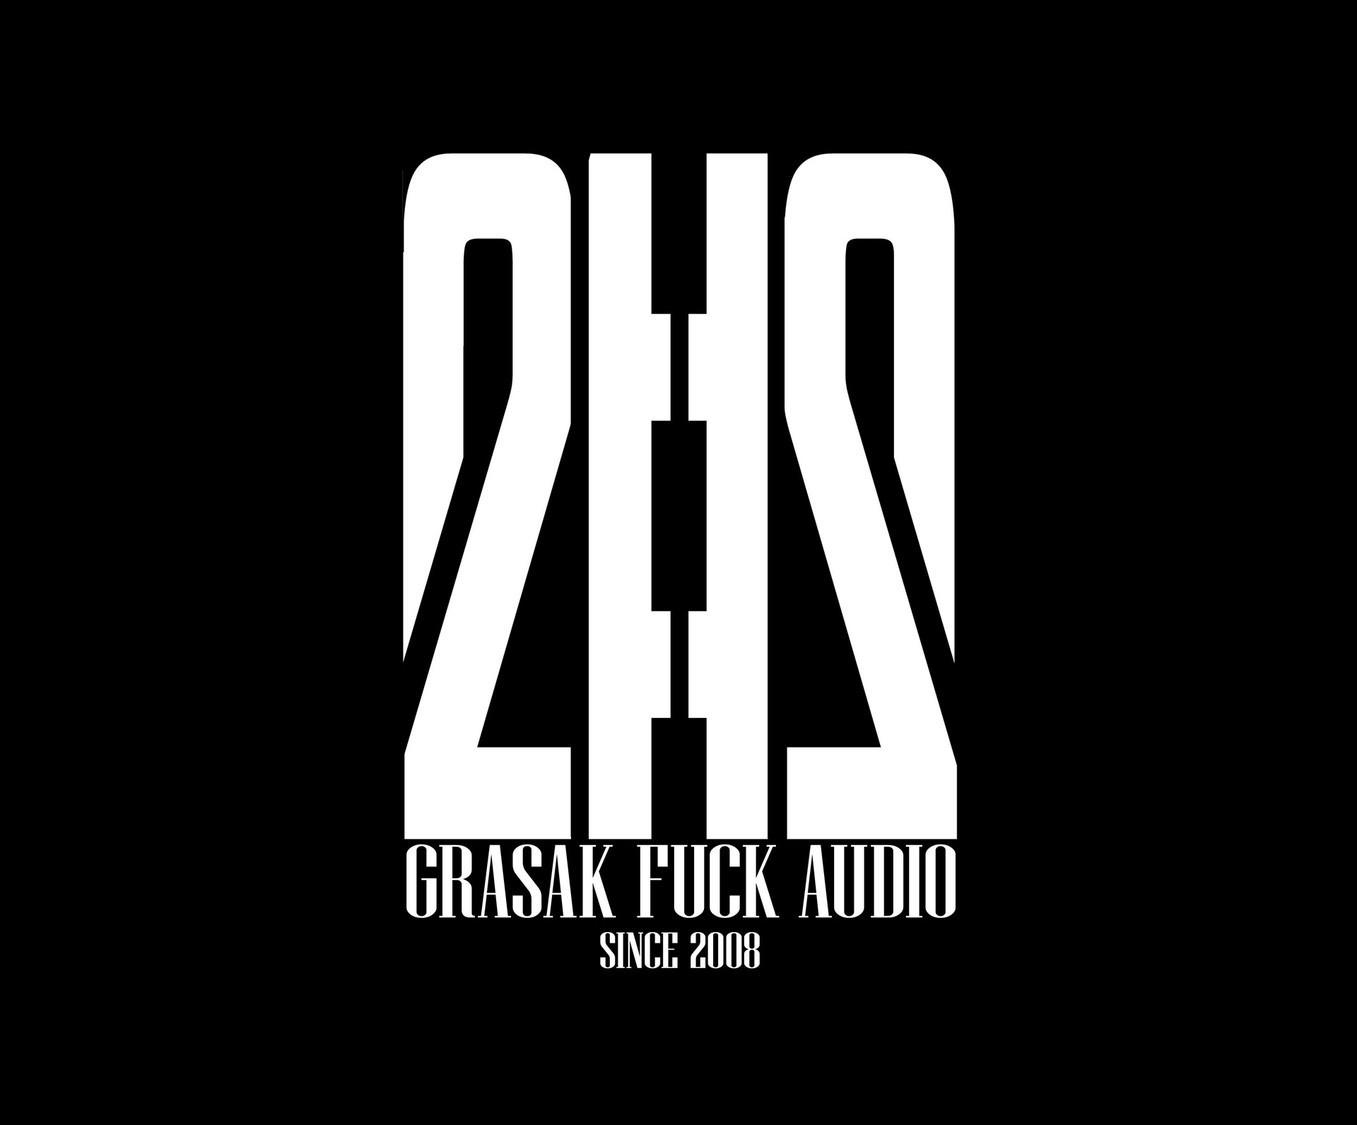 Sex story audio mp3